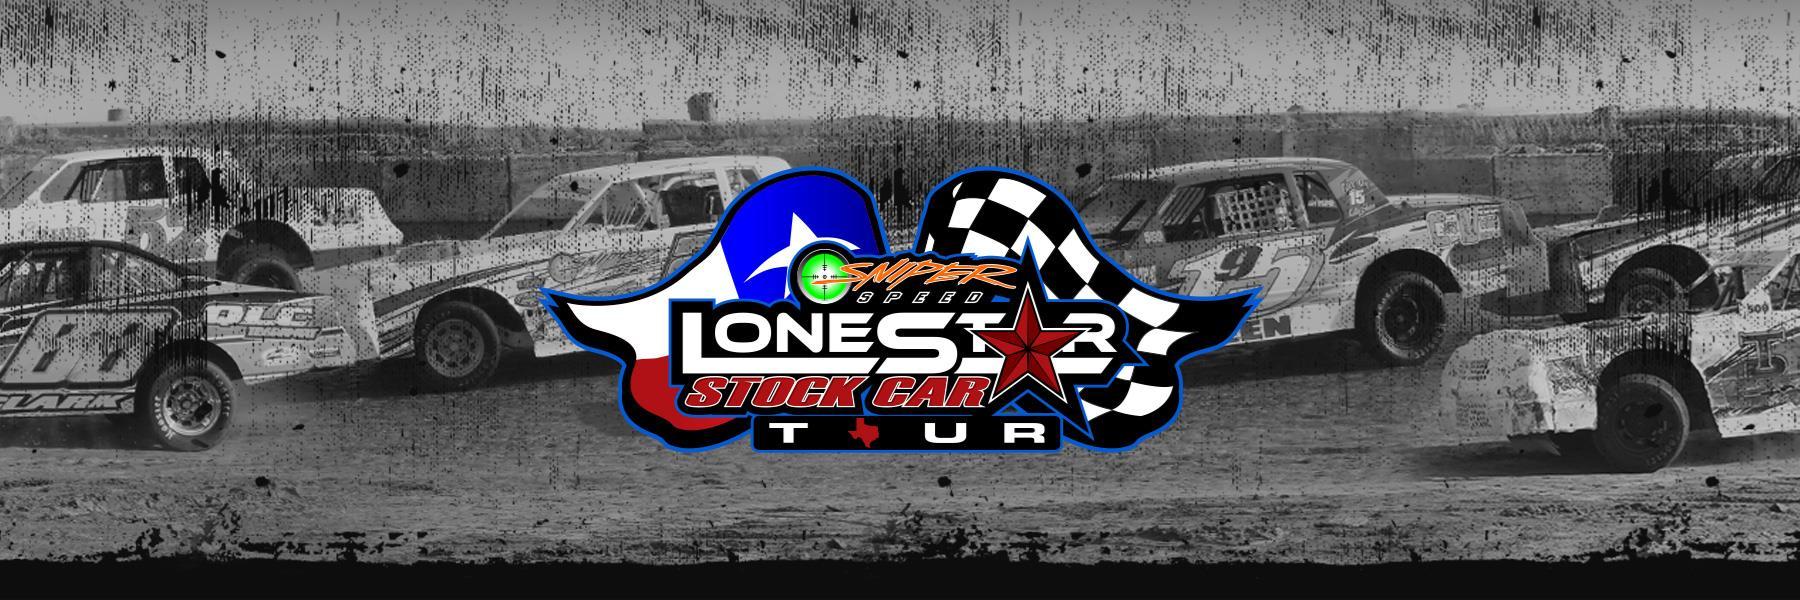 IMCA Lone Star Stock Car Tour